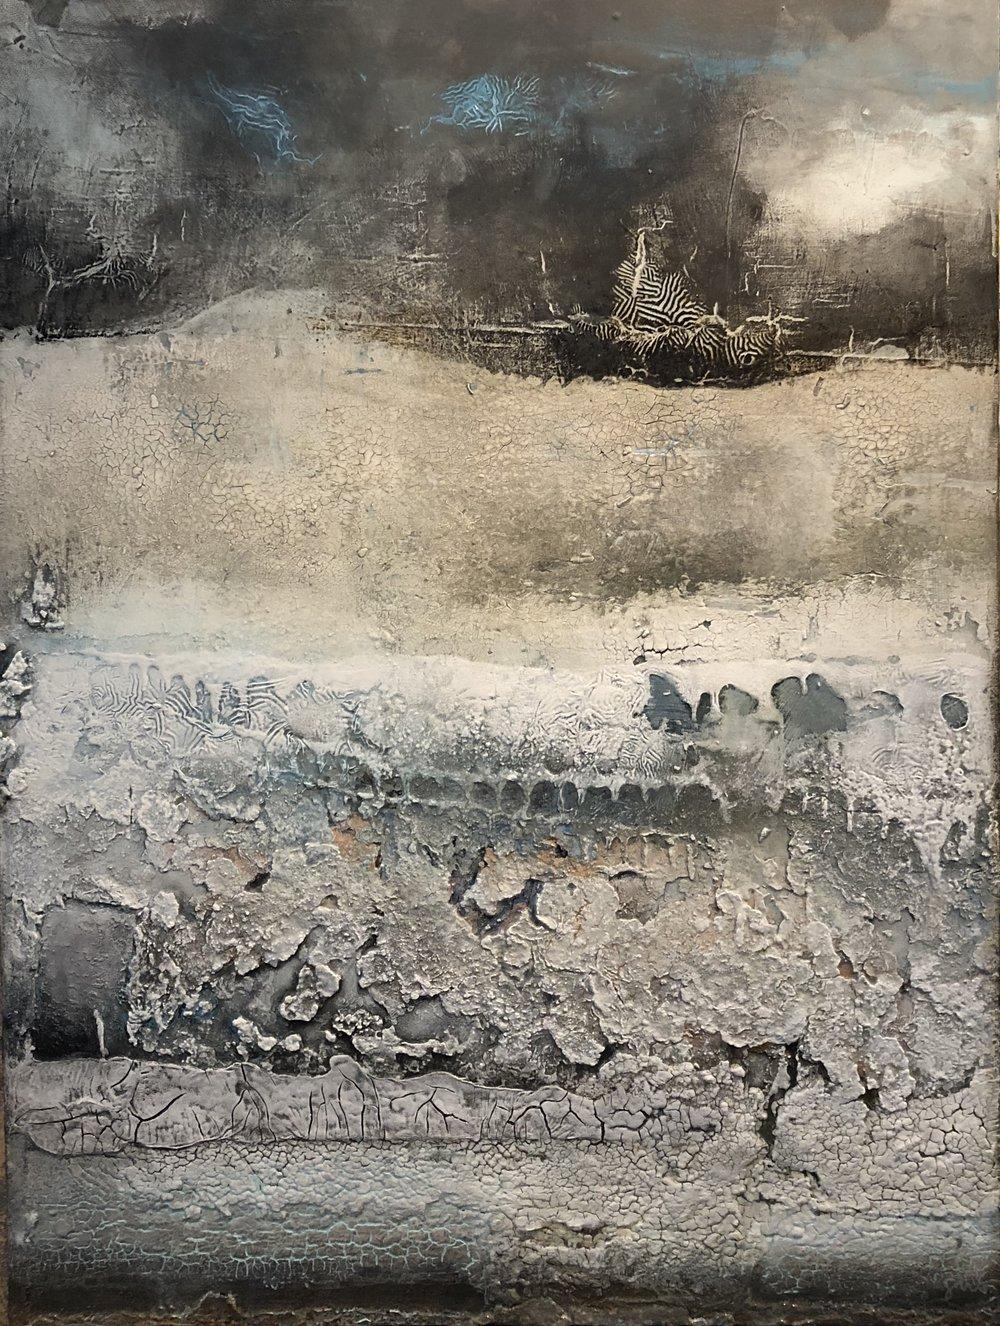 Untitled 5 by Gab Kokas